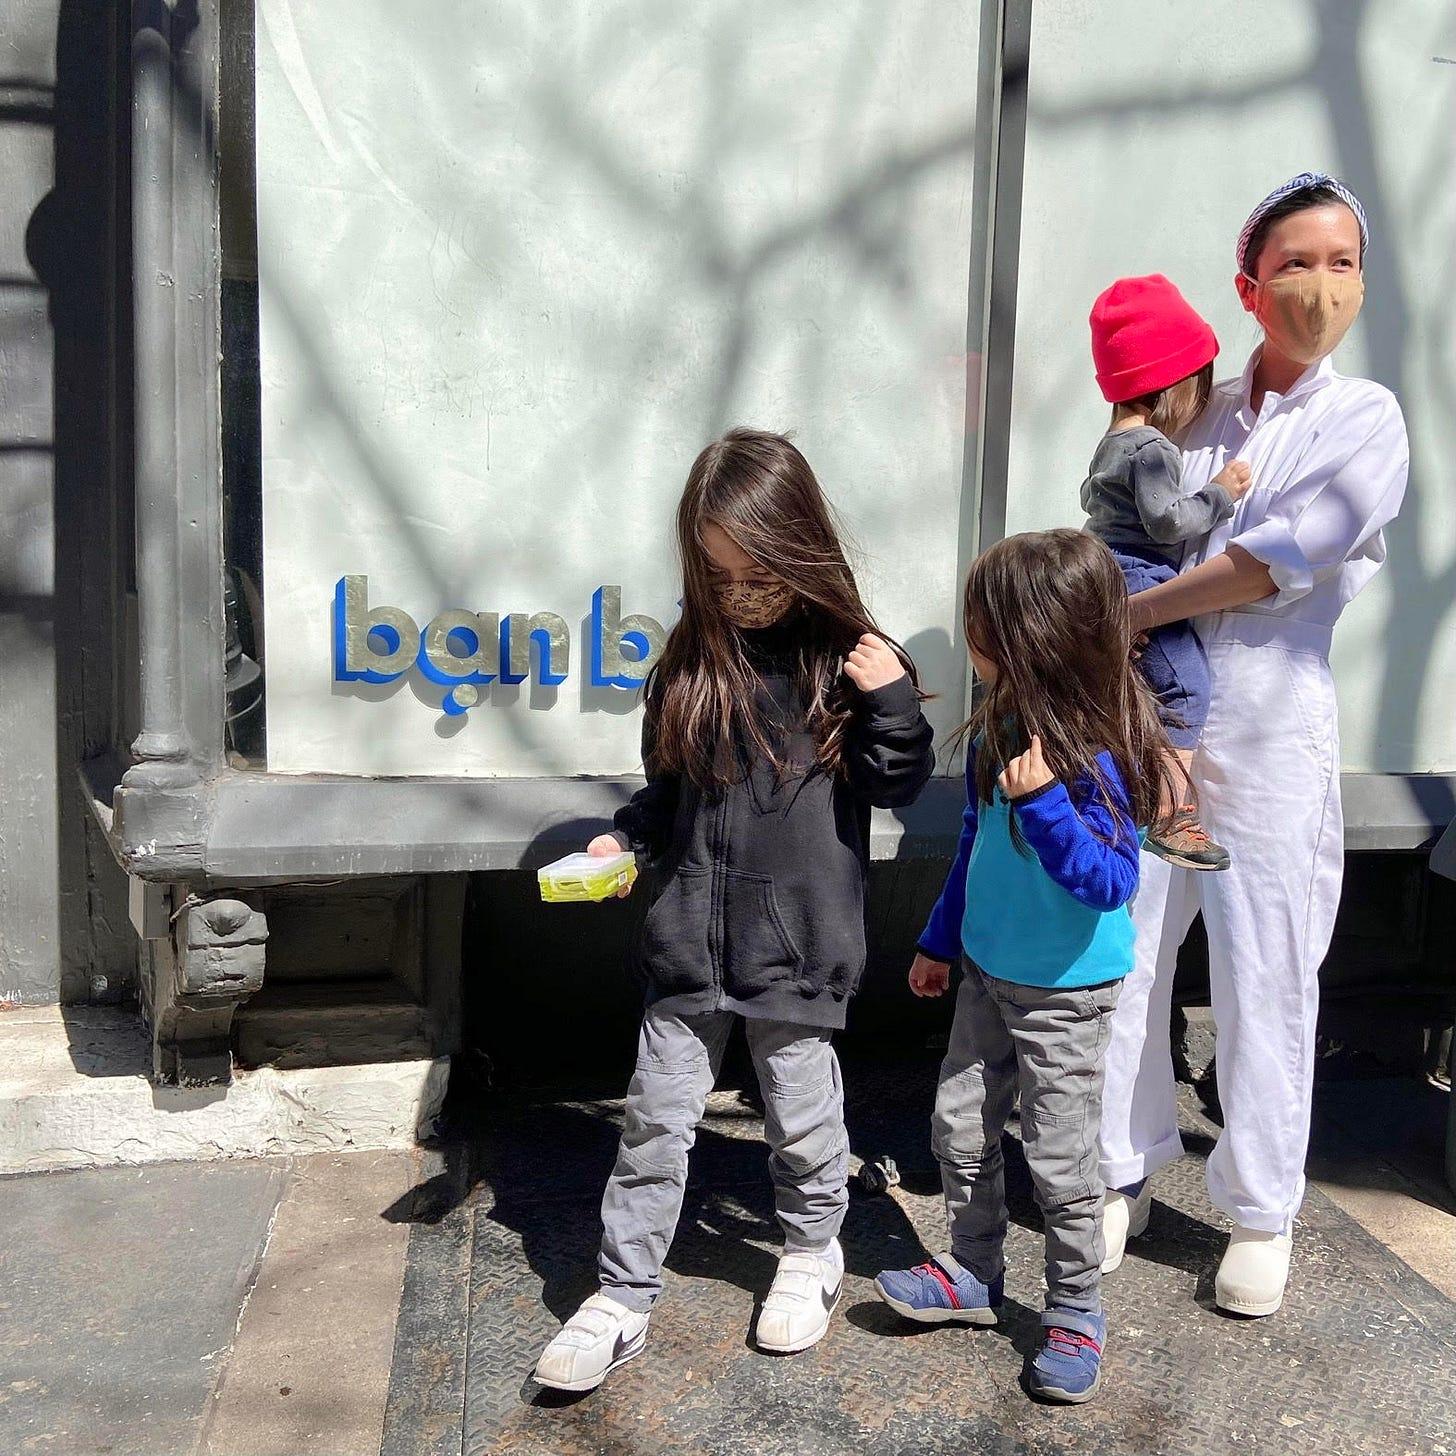 Doris Hồ-Kane with her three kids